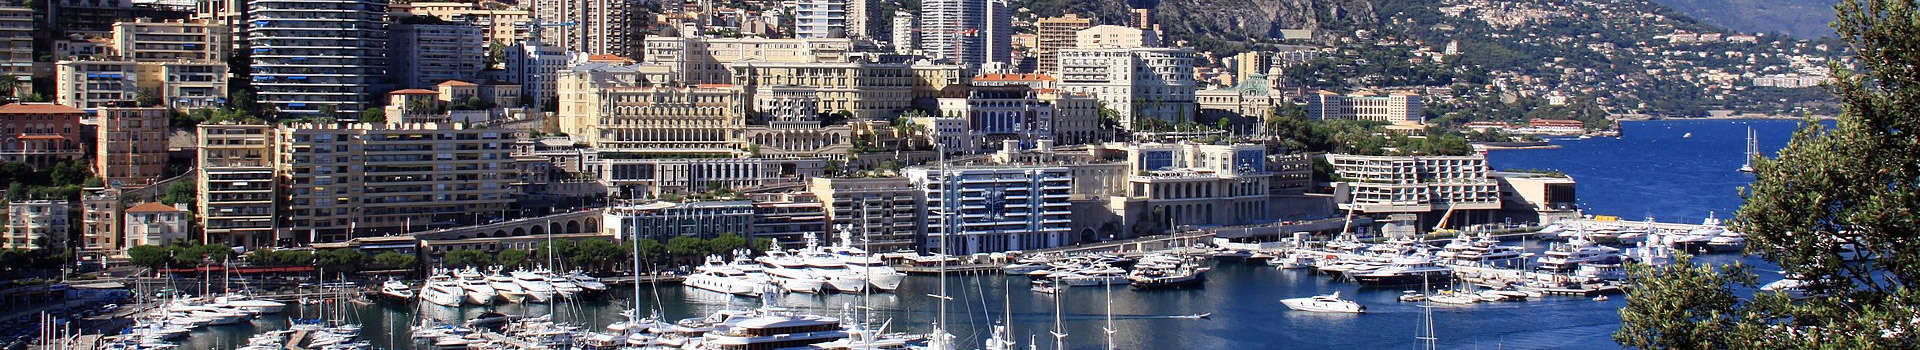 Monaco-Mote-Carlo-Av-rental-Company